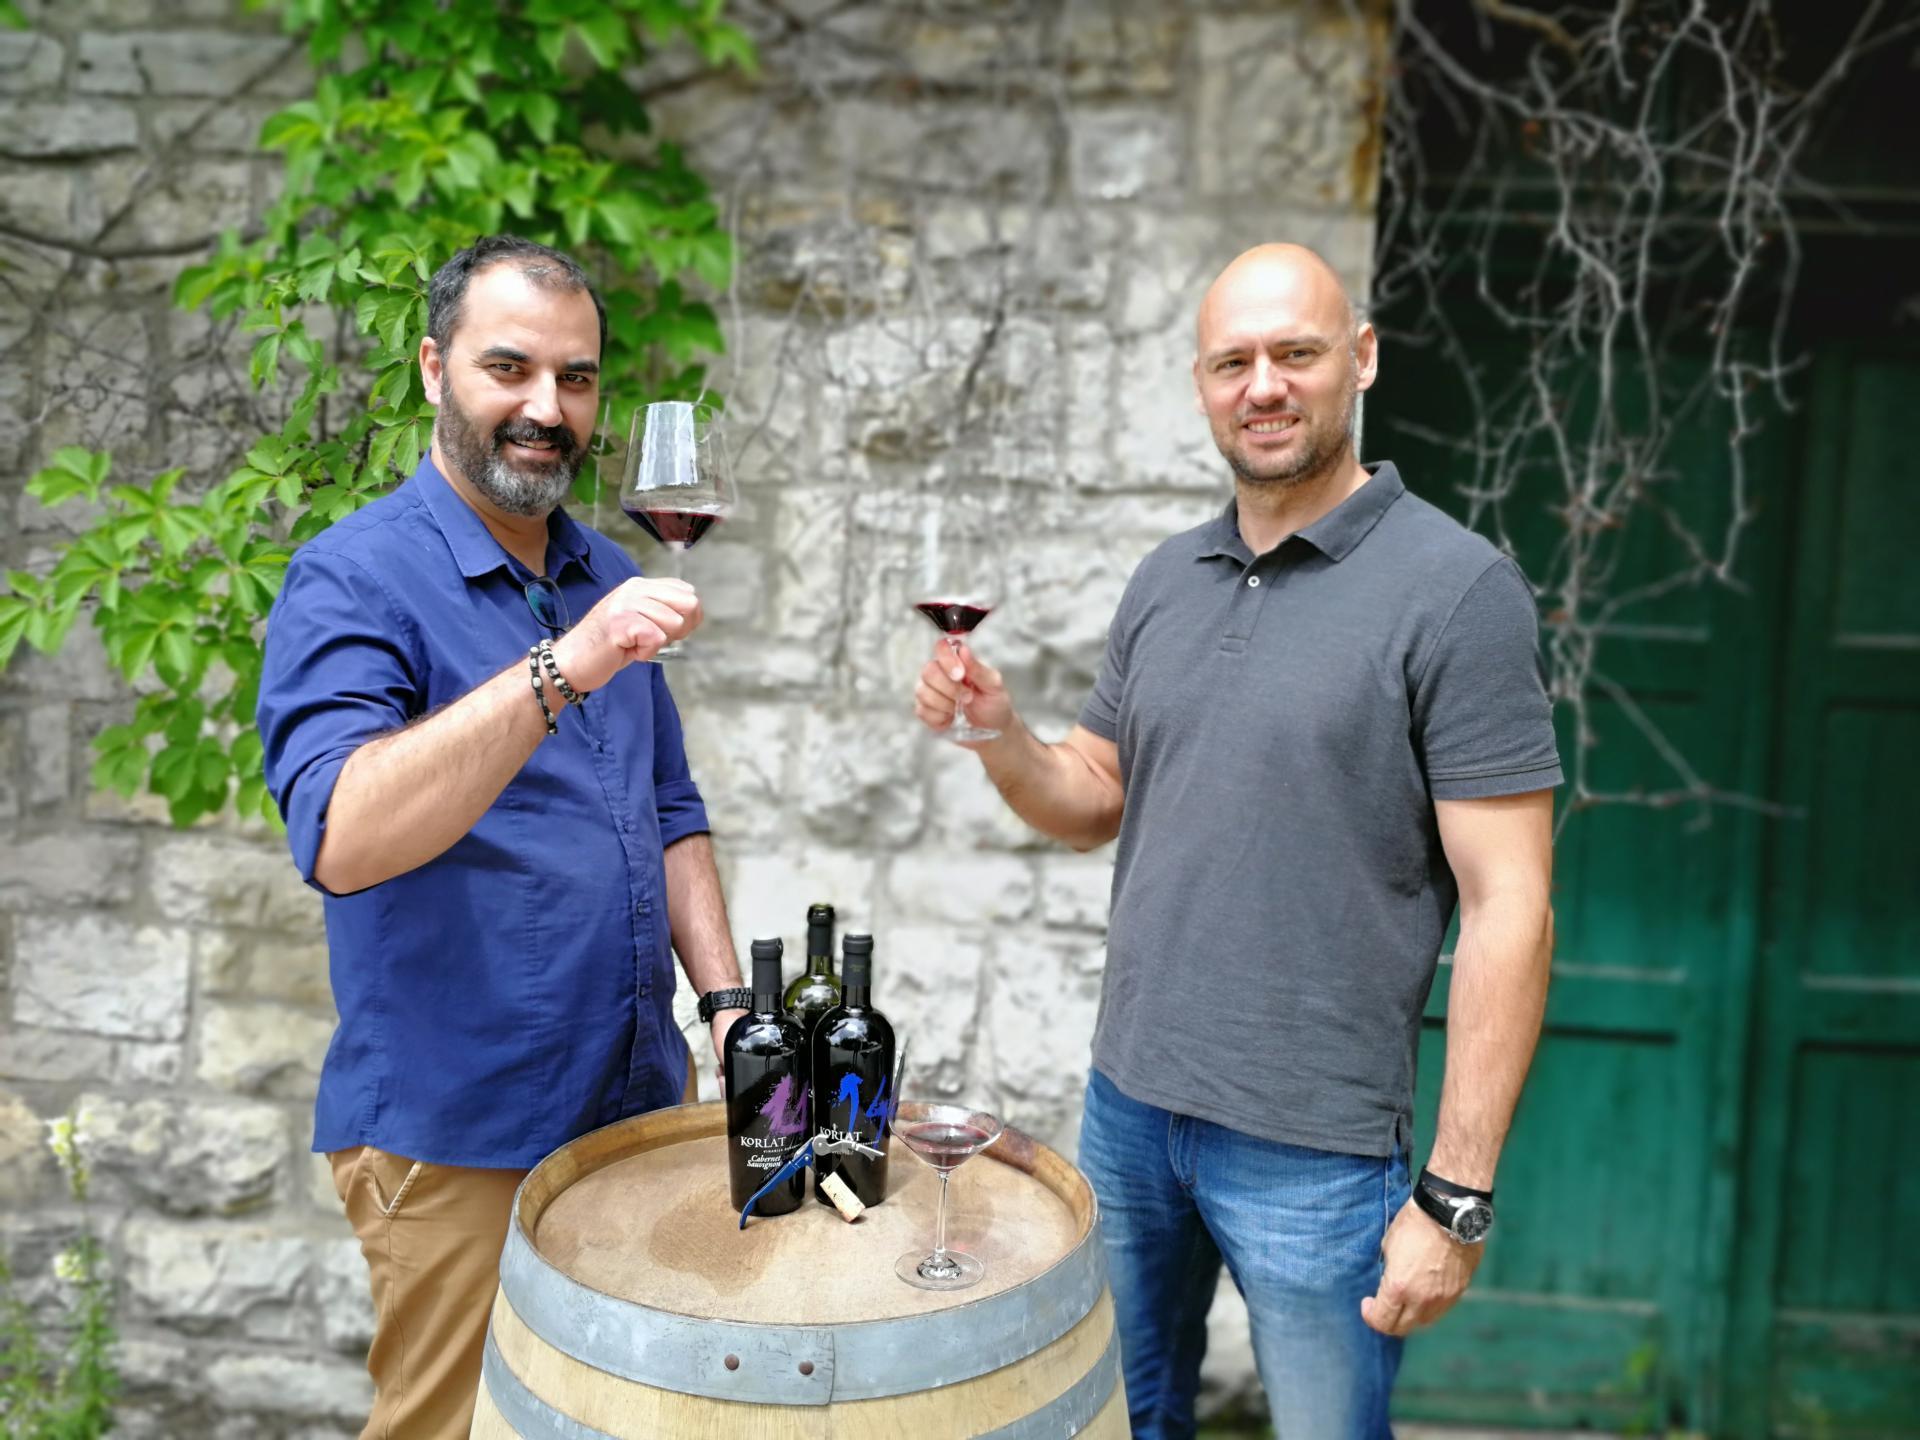 Božo Škara i Davor Mitrović pred Badelovom vinarijom u Benkovcu